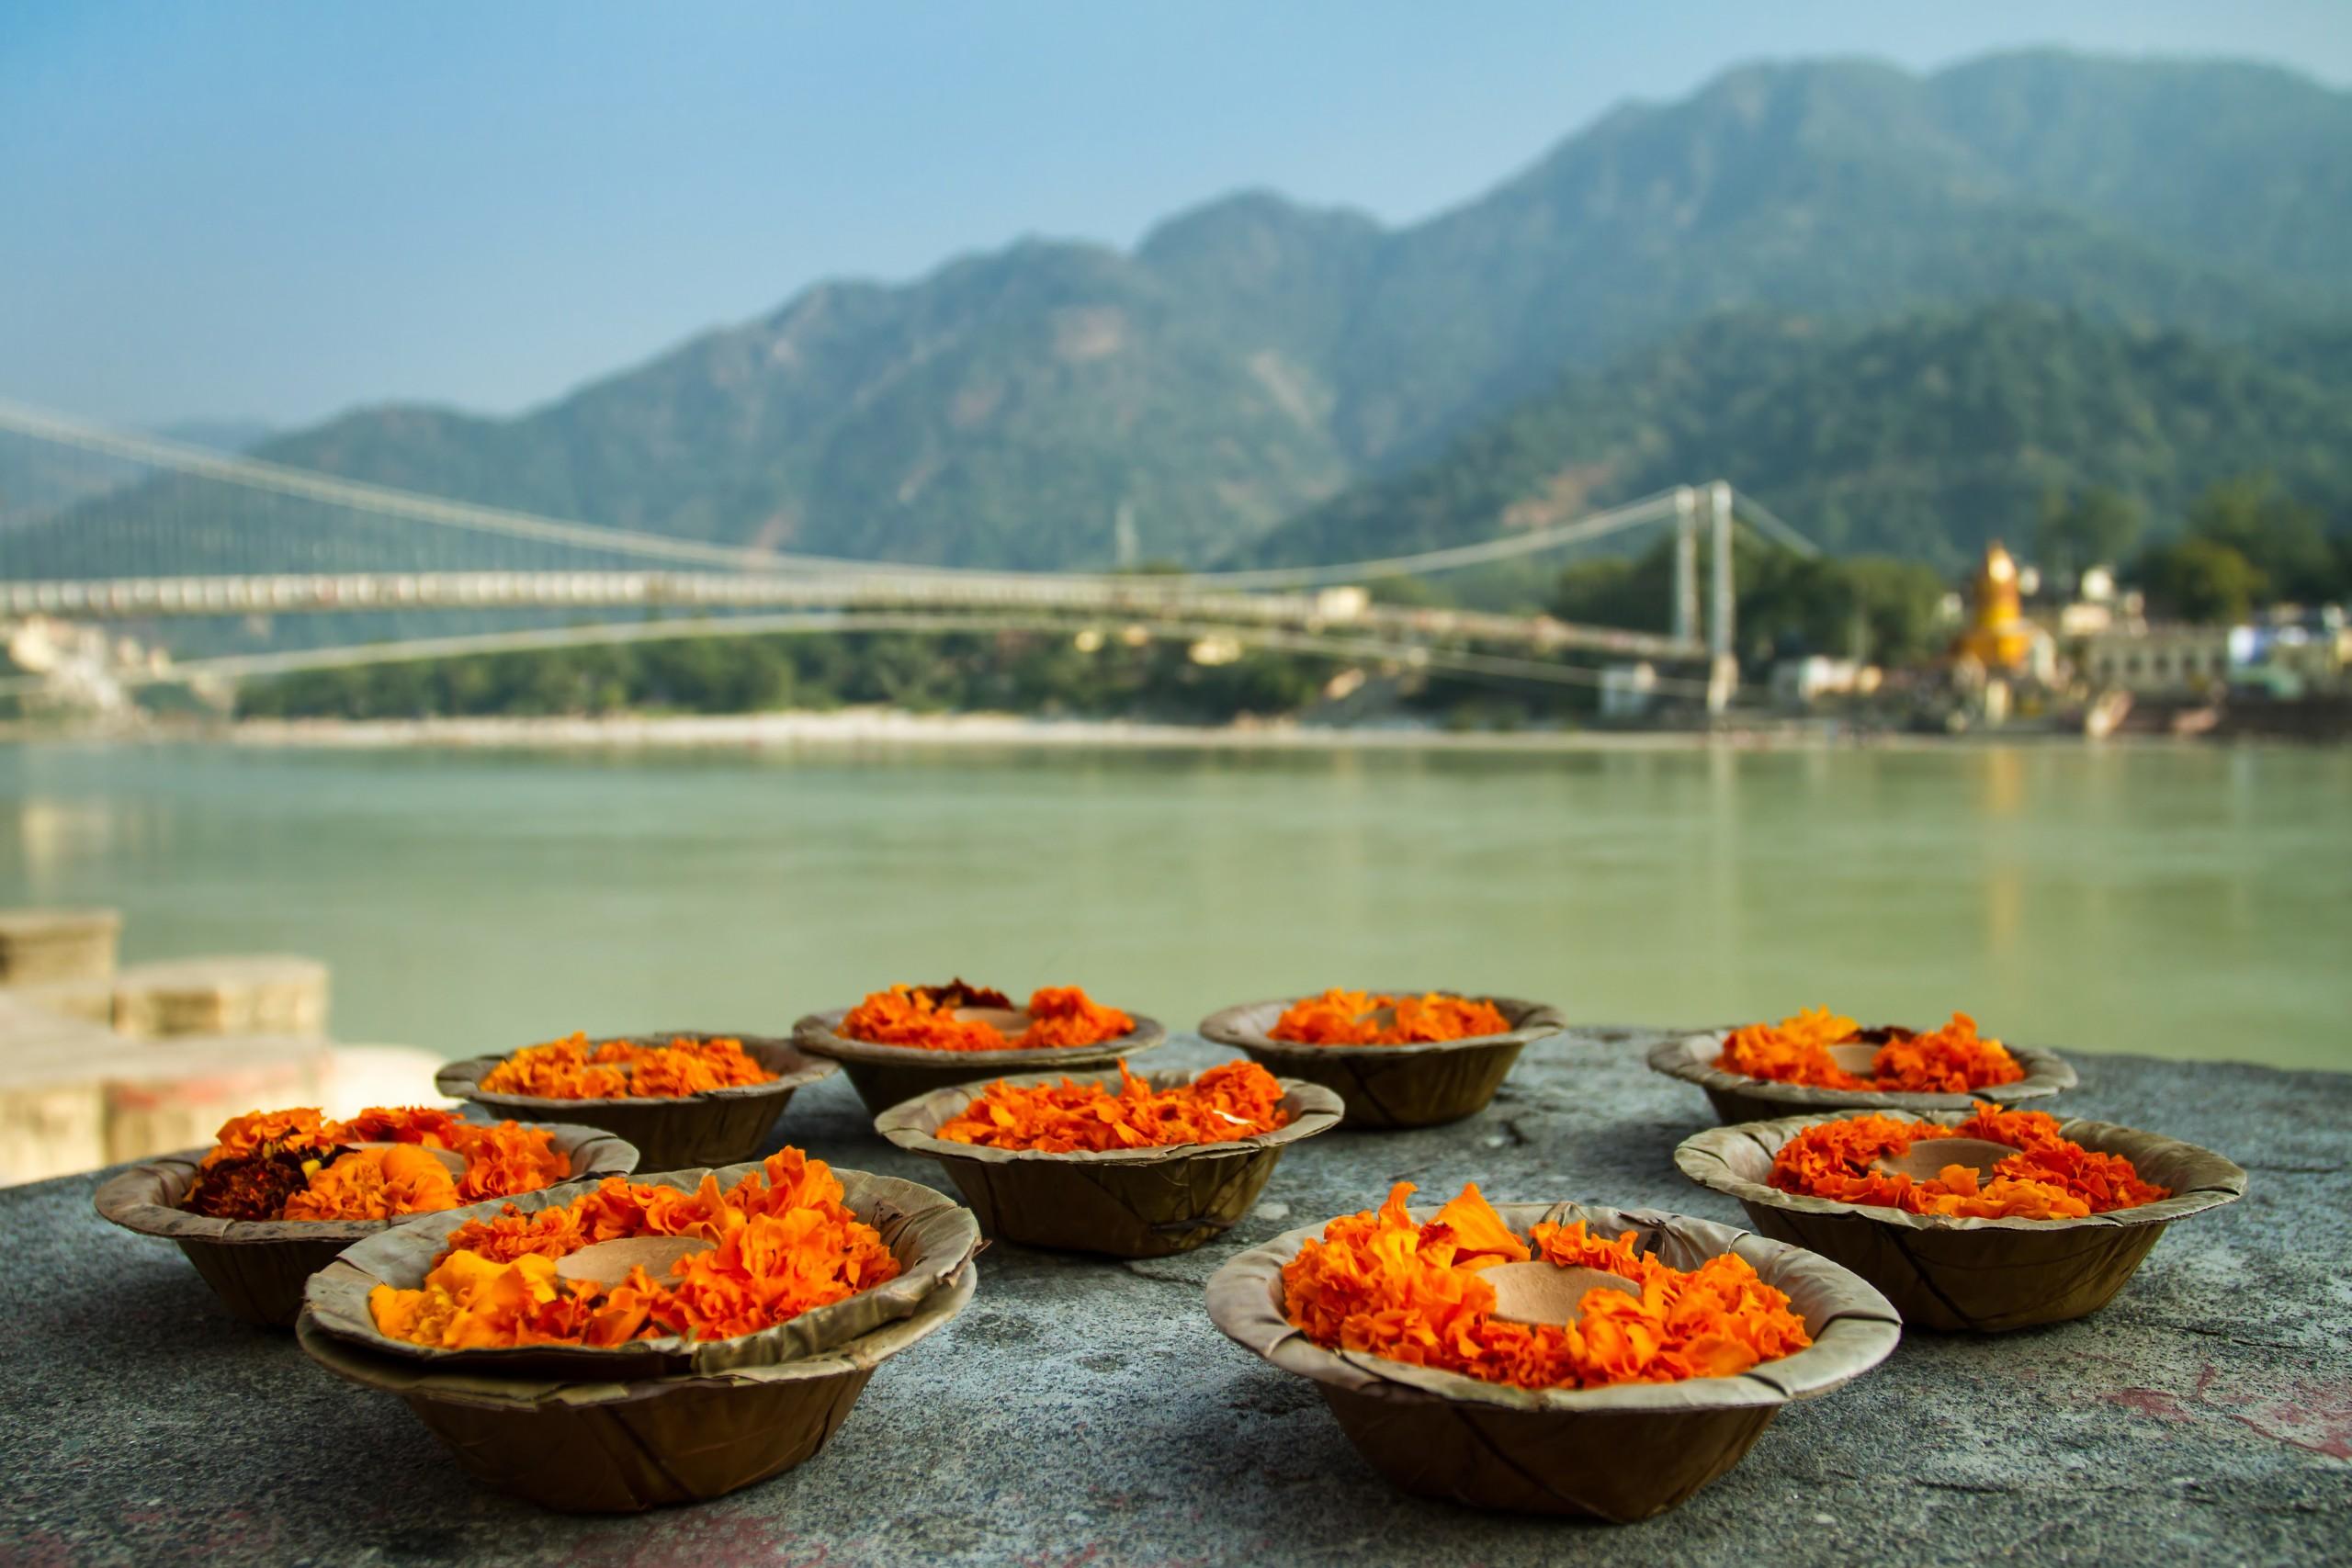 God offerings at Ram Jhula bridge Rishikesh, Uttrakhand